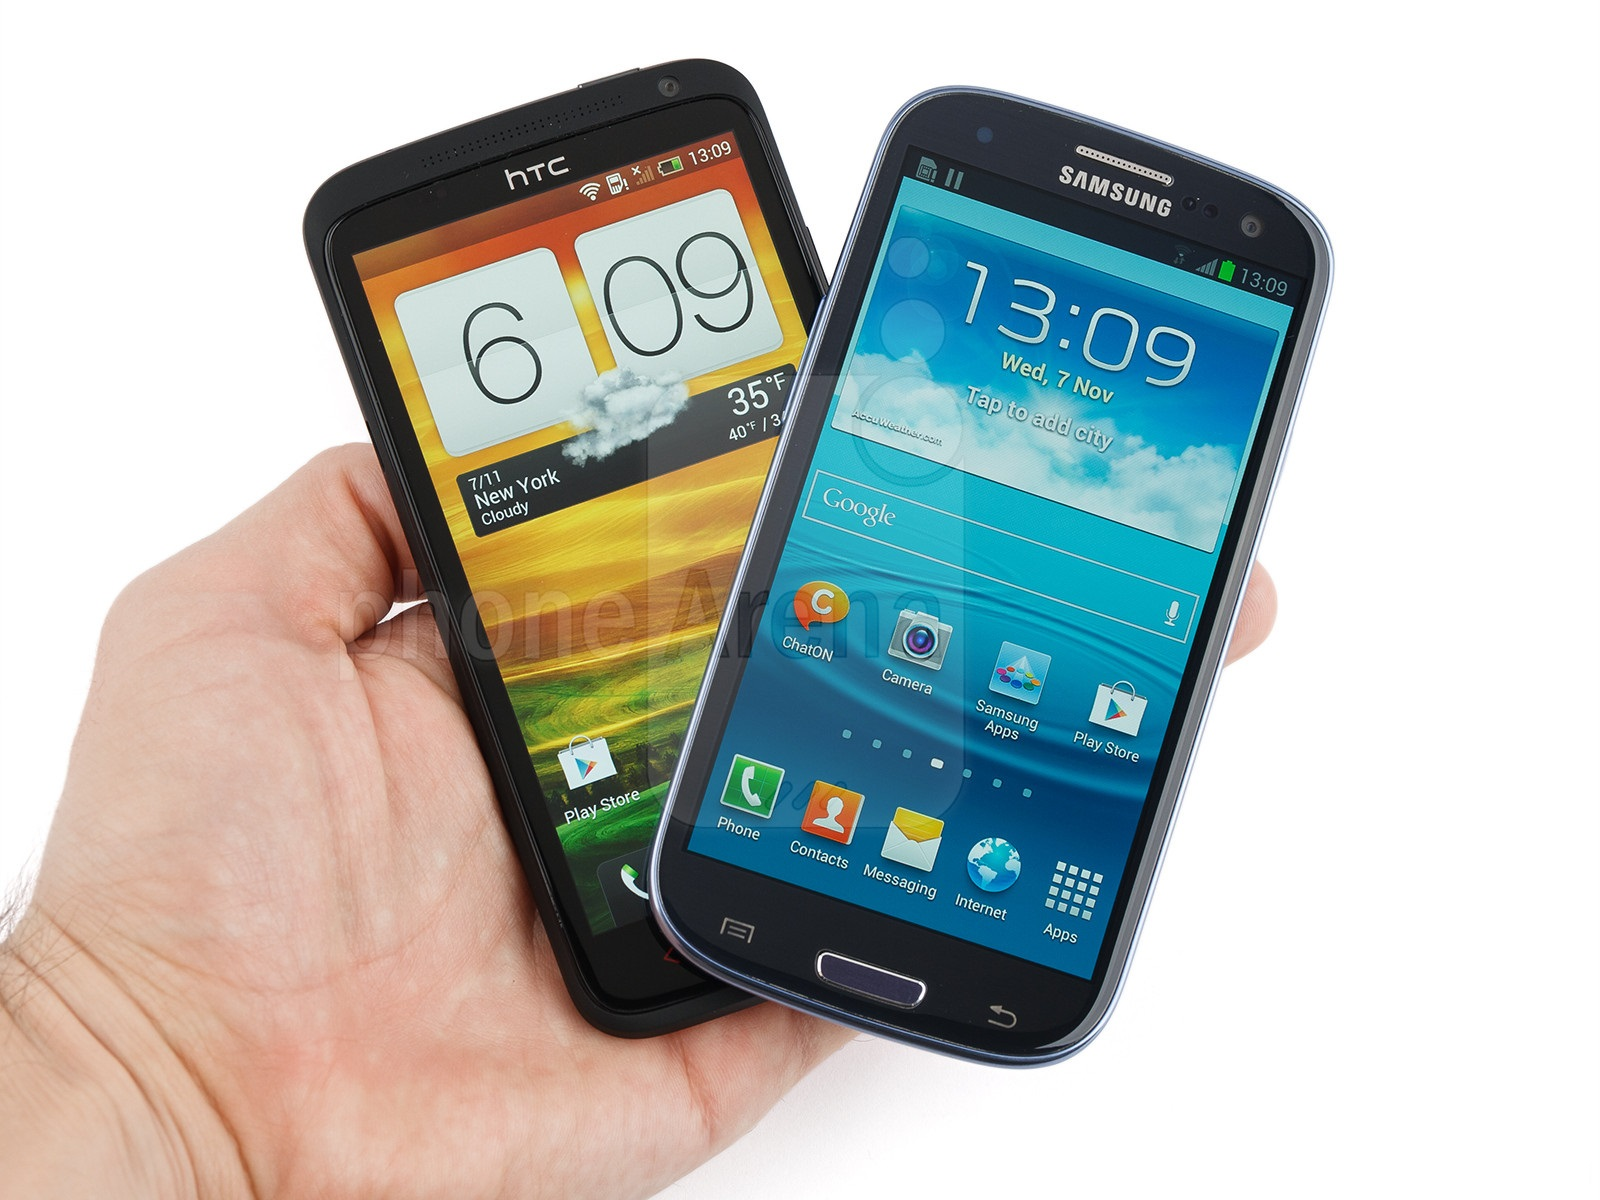 HTC One X vs. The Samsung Galaxy Note II